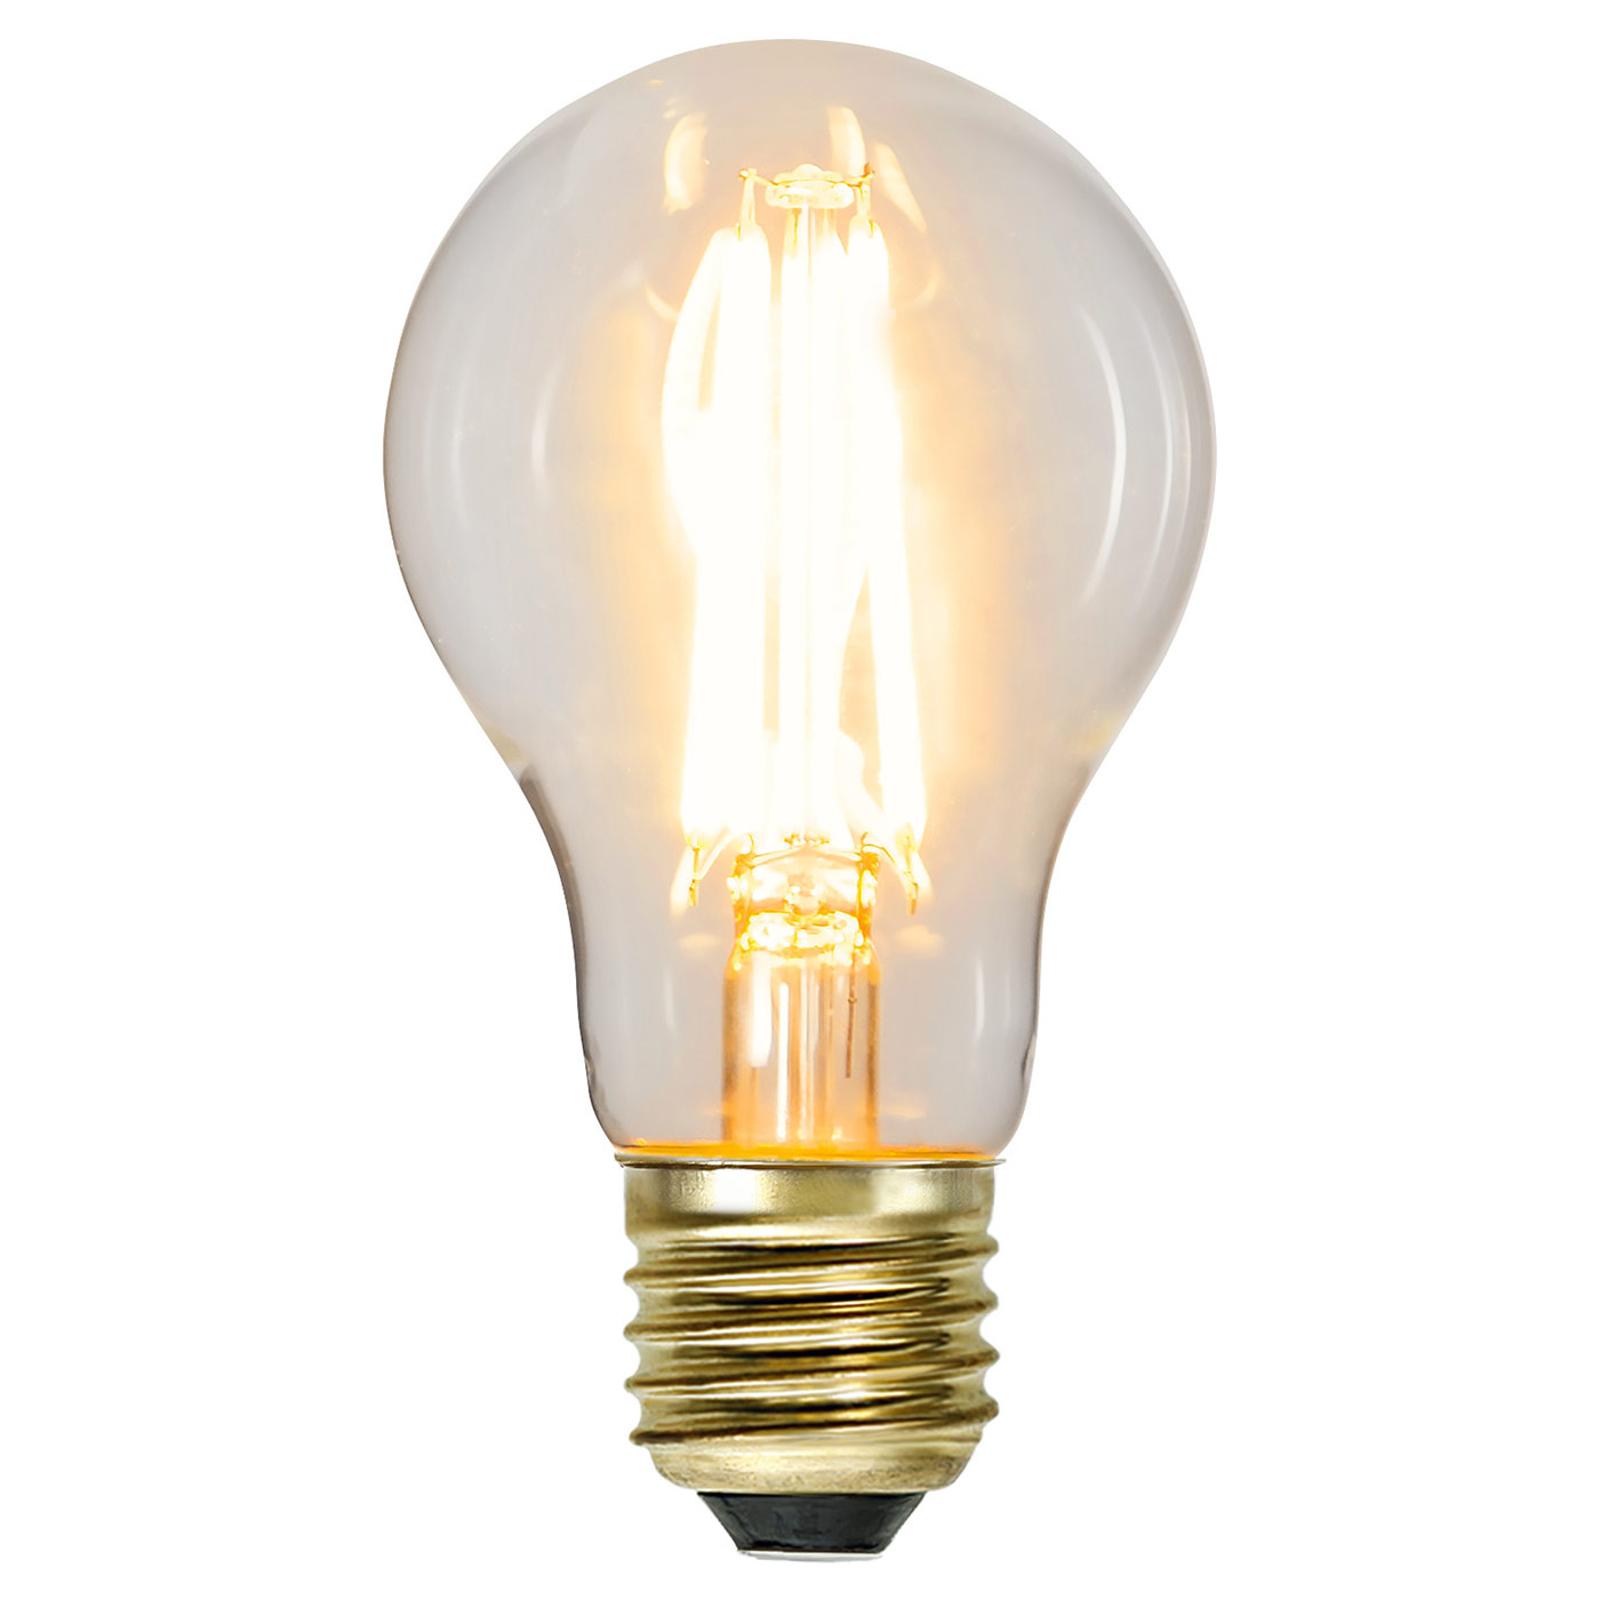 LED-Lampe E27 6,5W Soft Glow 2.100K 3-Step dimming